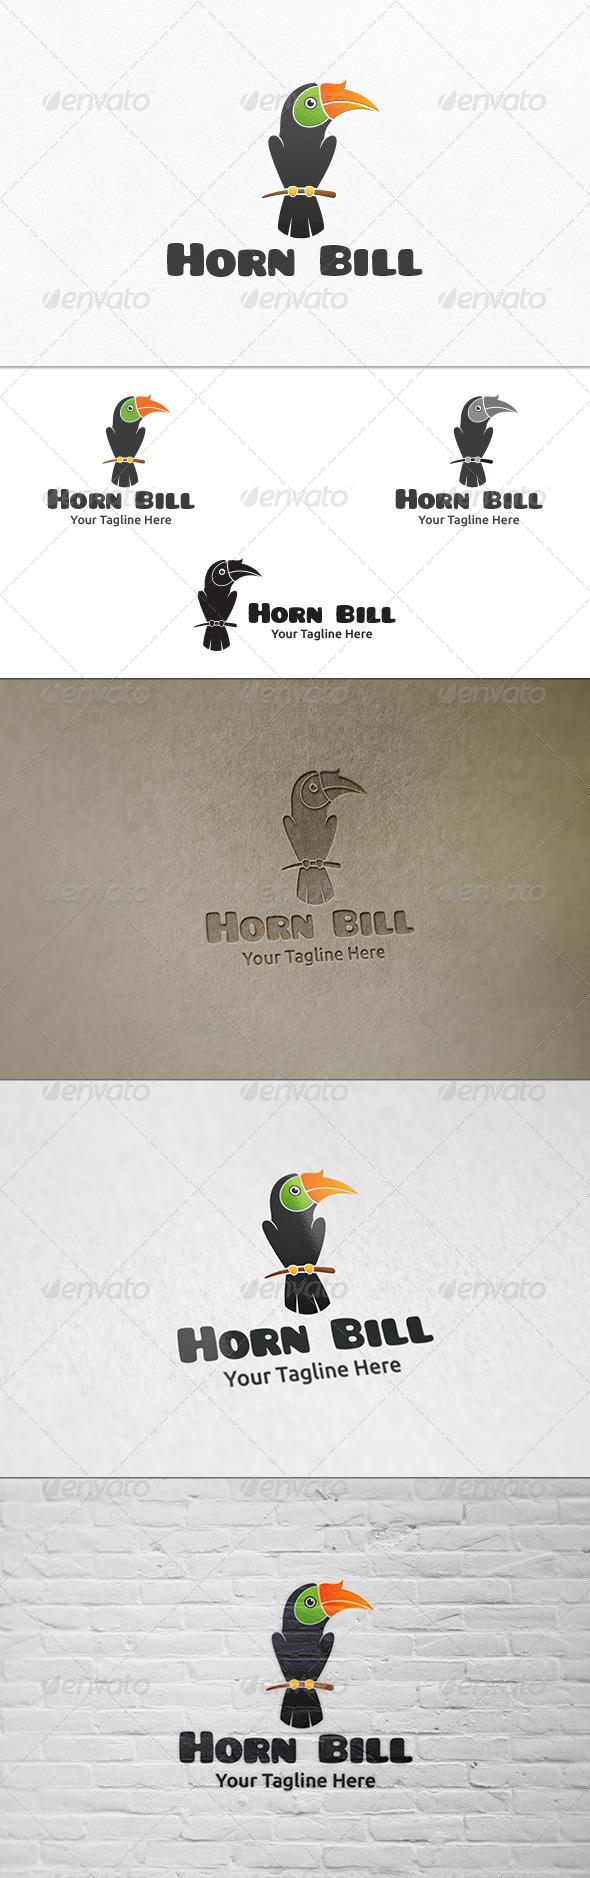 Hornbill - Logo Template